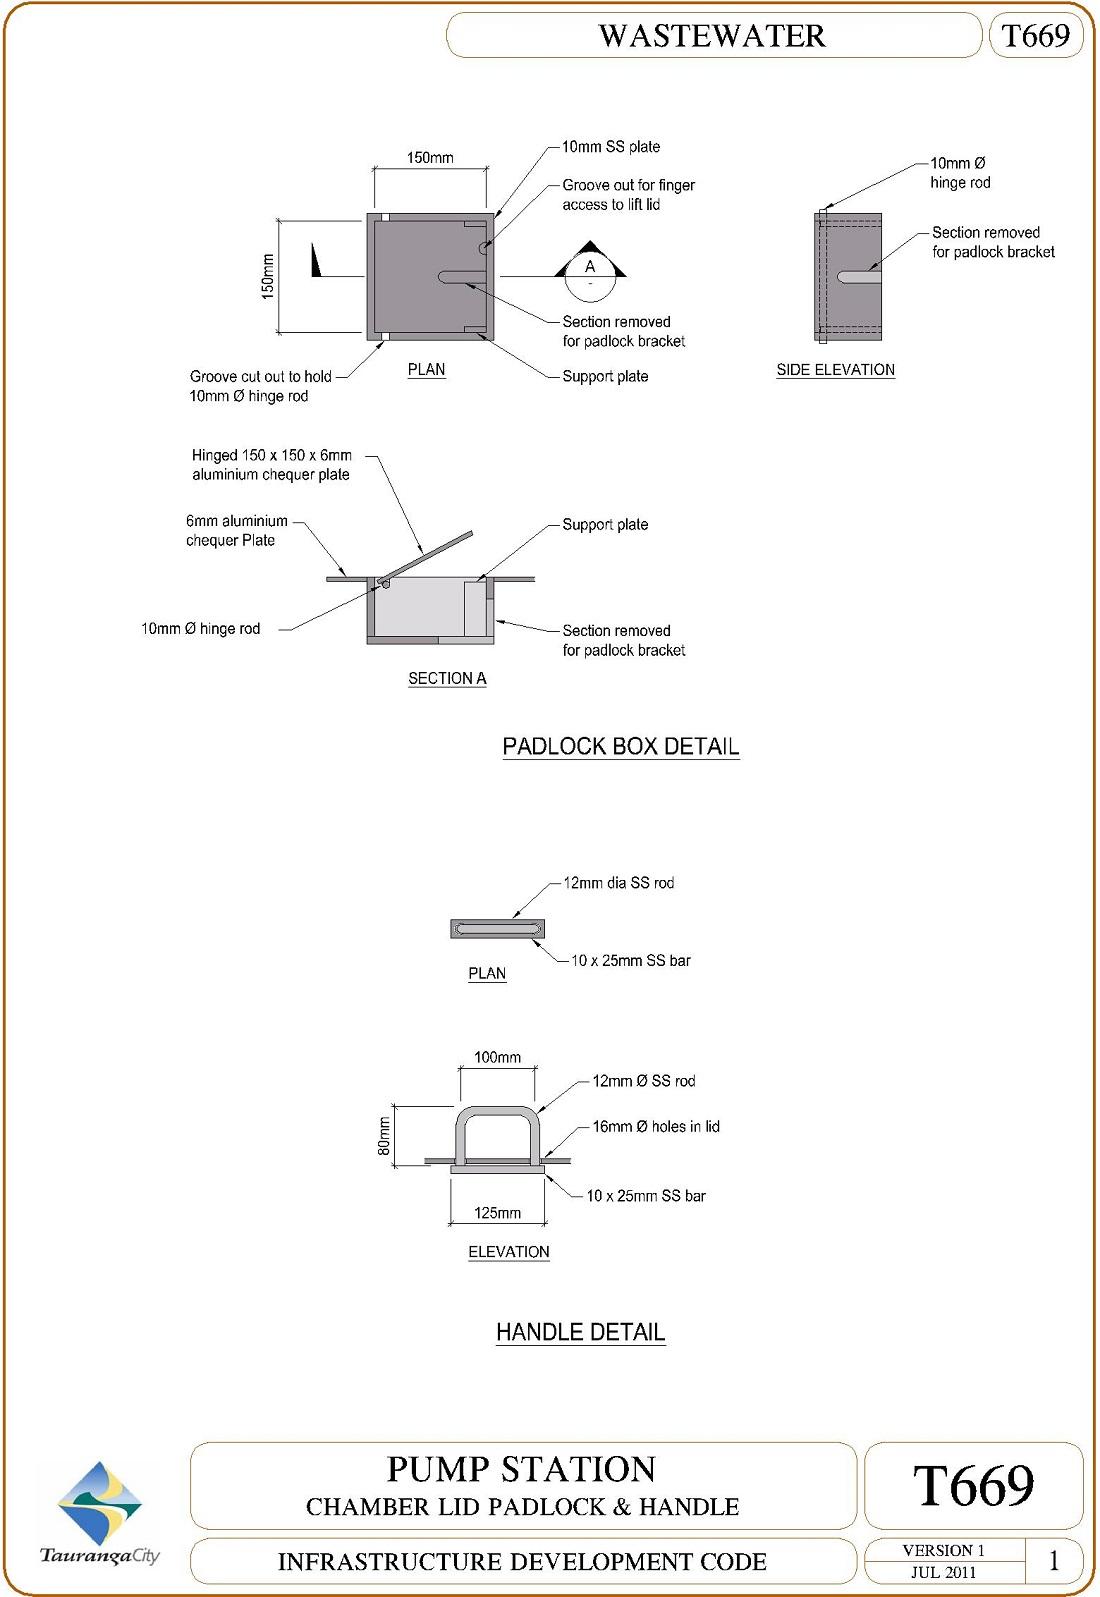 Pump Station - Chamber Lid Padlock and Handle